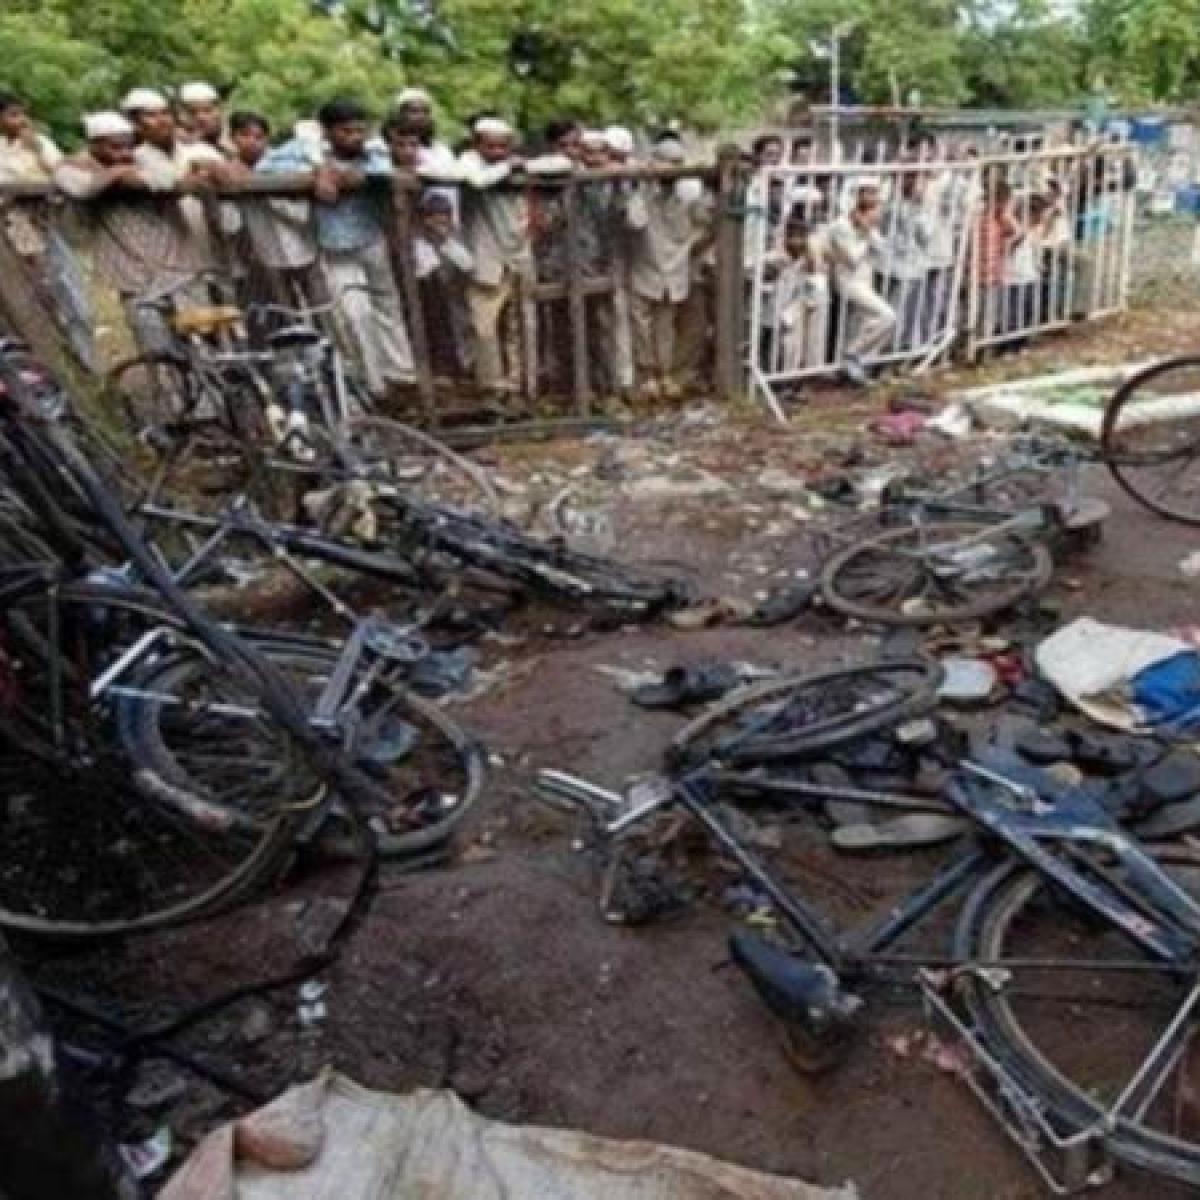 2008 Malegaon blast case: Victim's father makes plea to expedite the trial